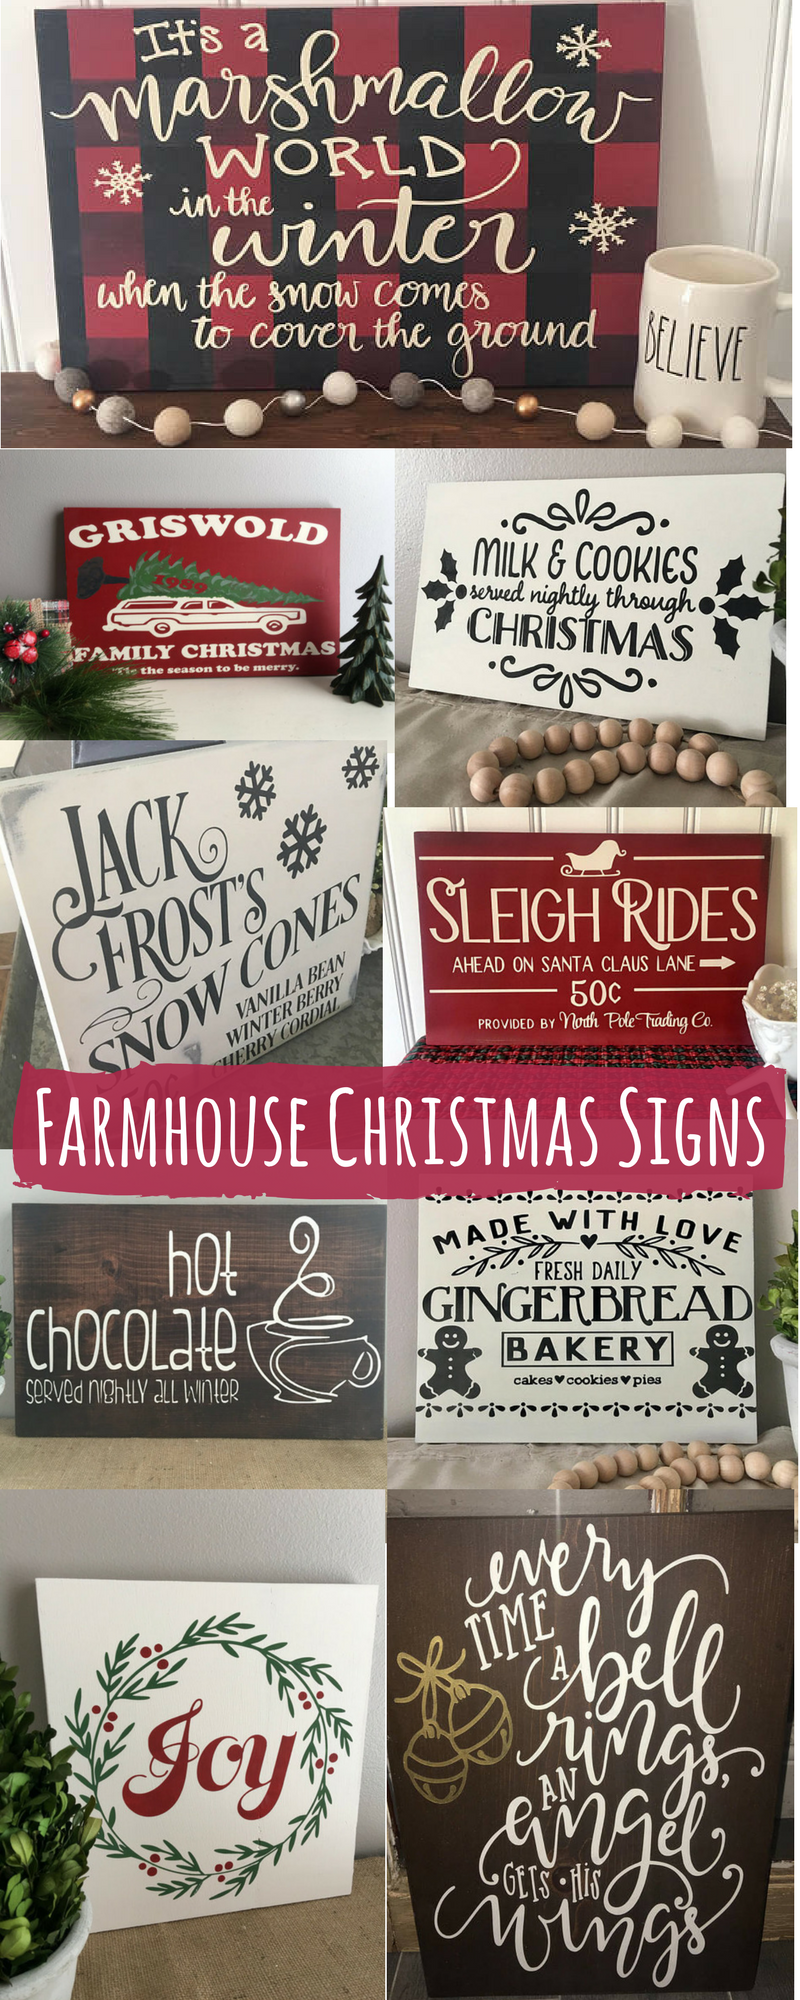 Farmhouse Christmas Signs Christmas Signs Diy Christmas Signs Christmas Diy